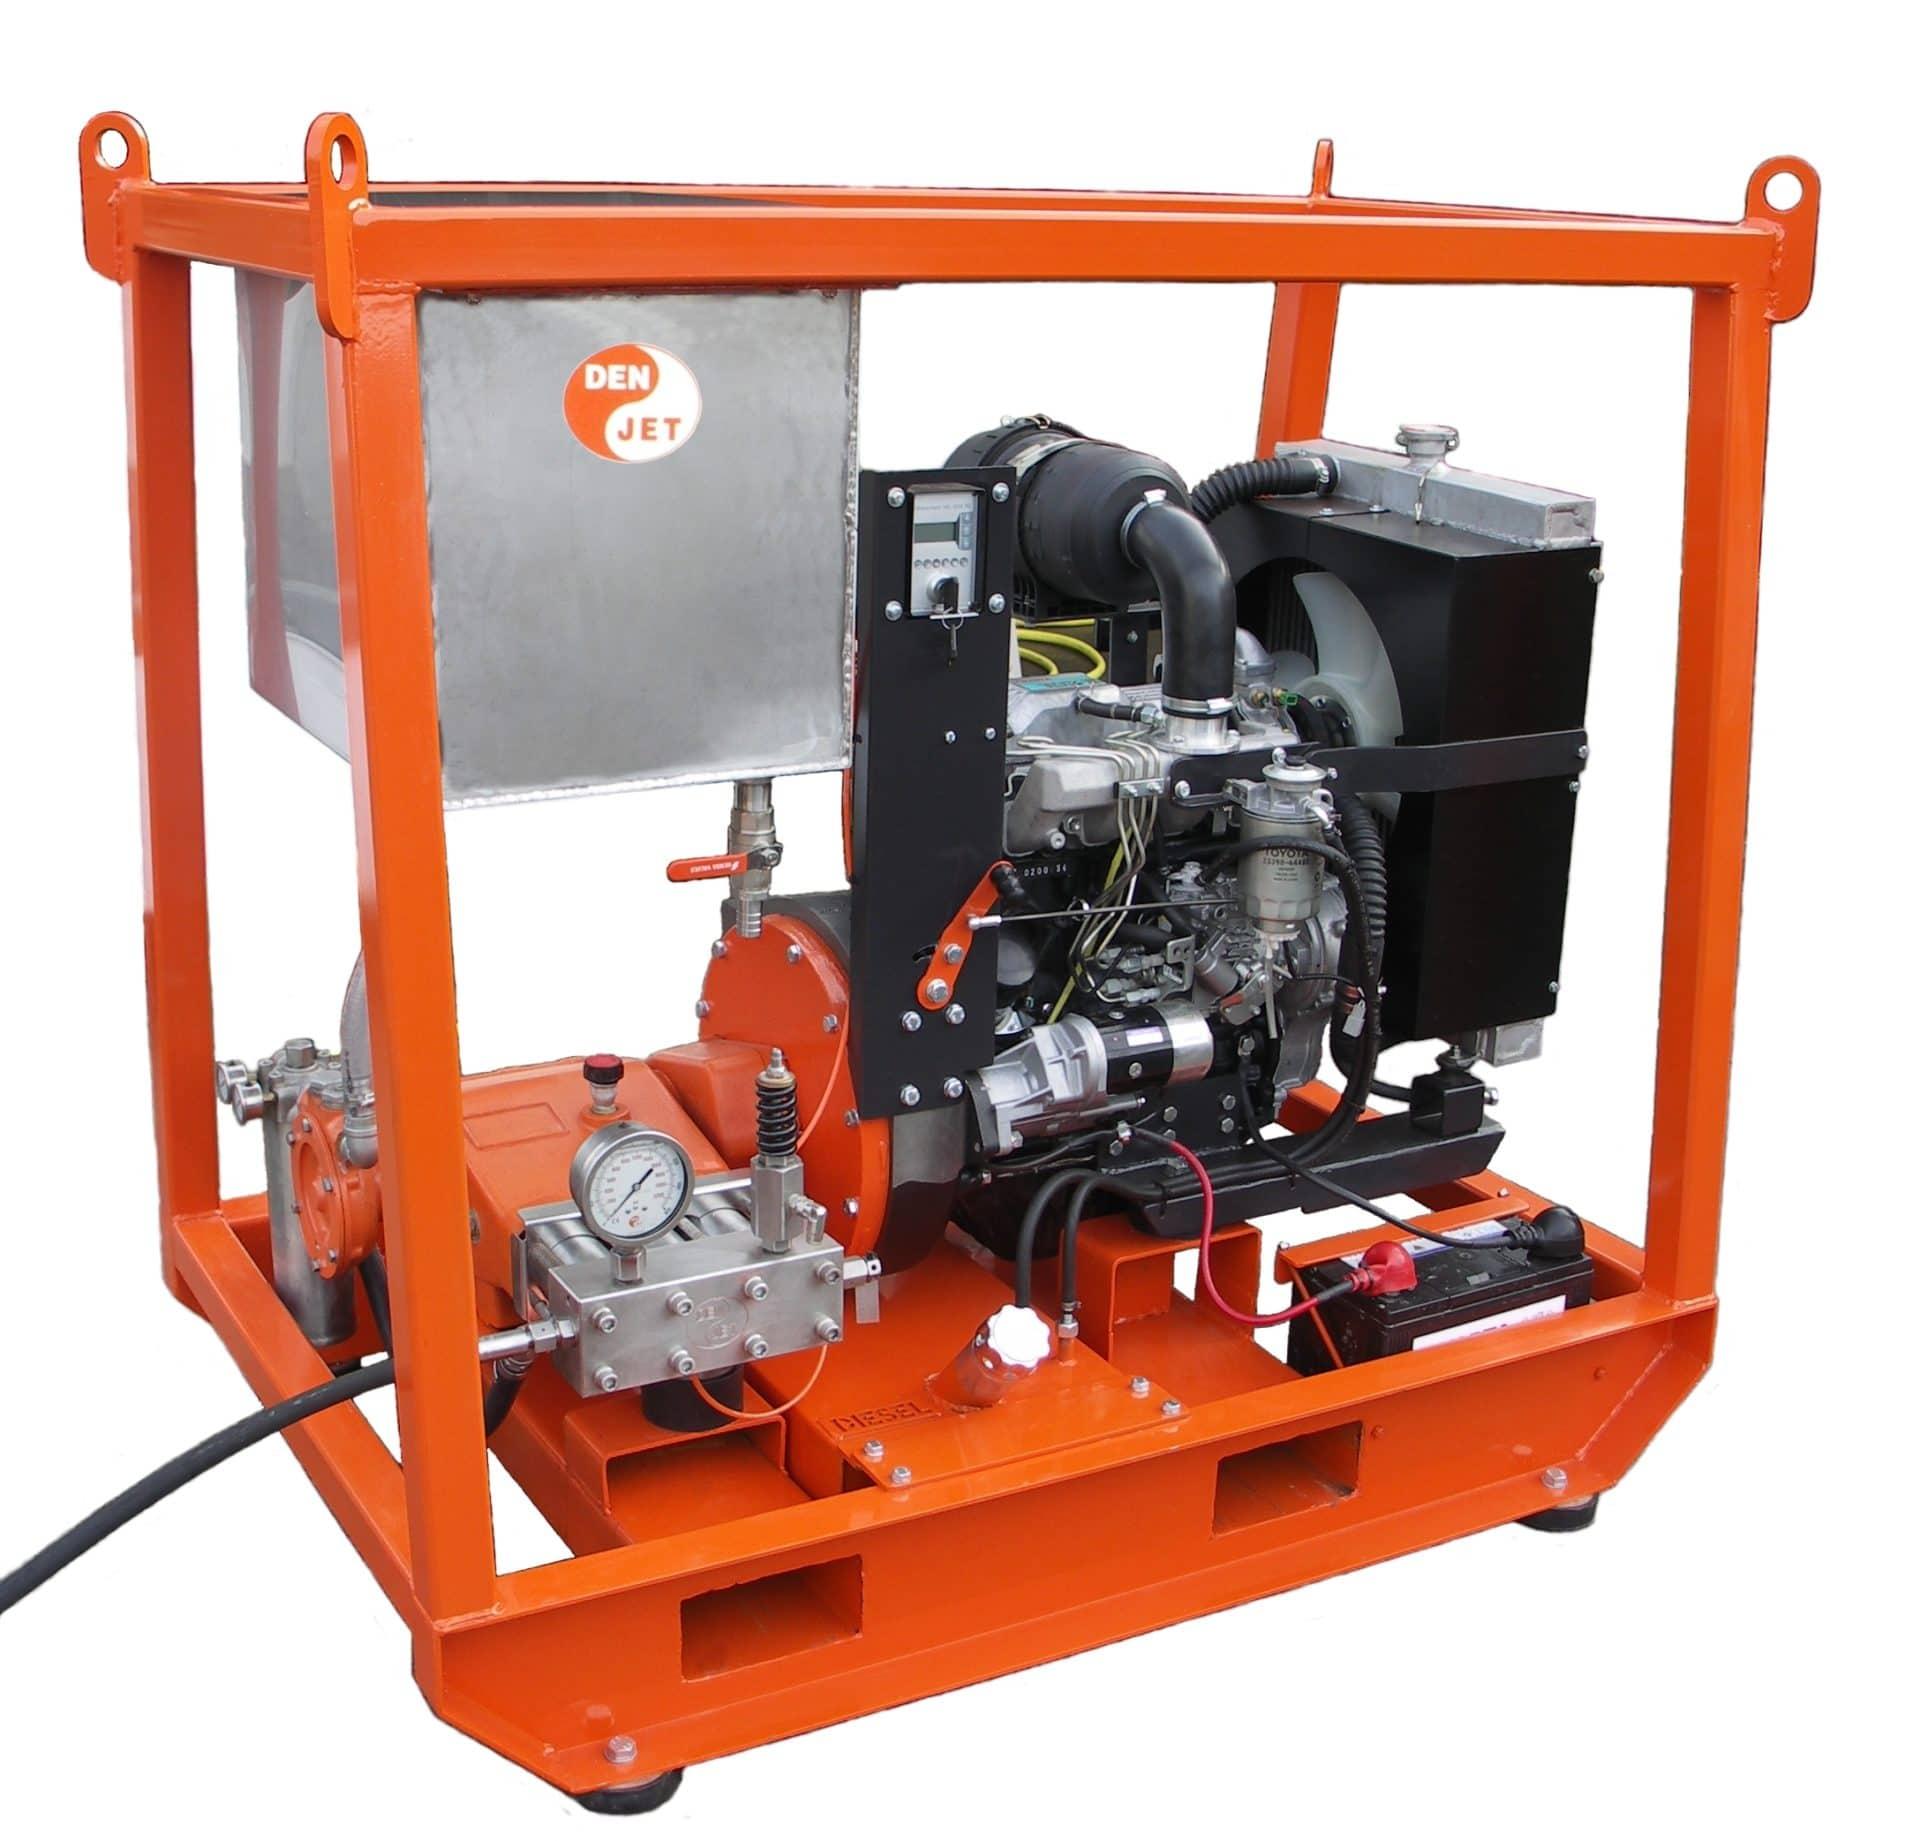 THP UHP - Denjet CD50 Series